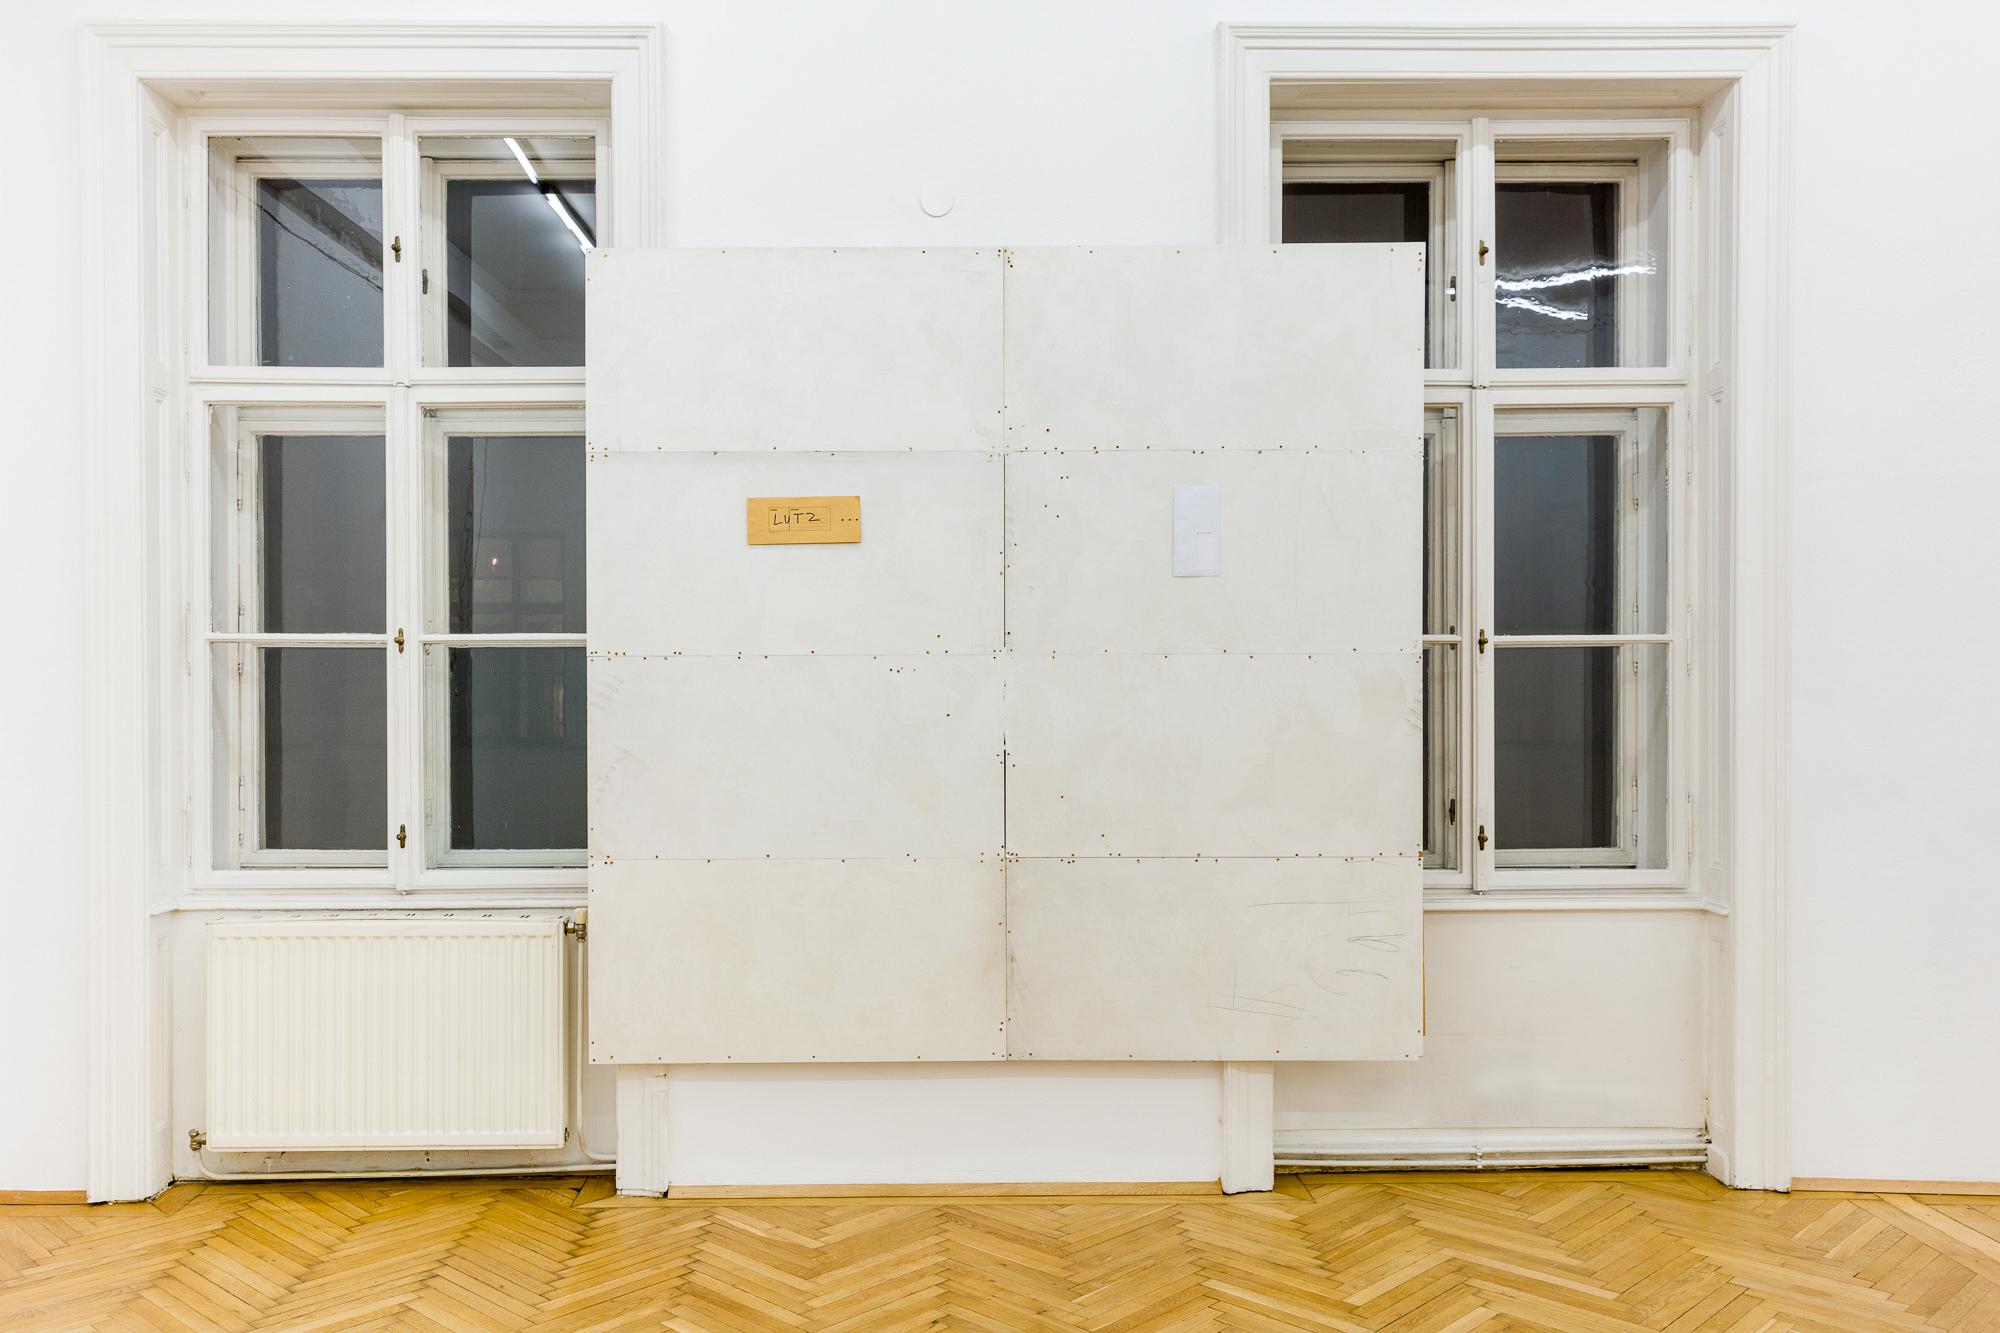 2018_11_08_Vera Lutz at Felix Gaudlitz_by kunst-dokumentation.com_036_web.jpg